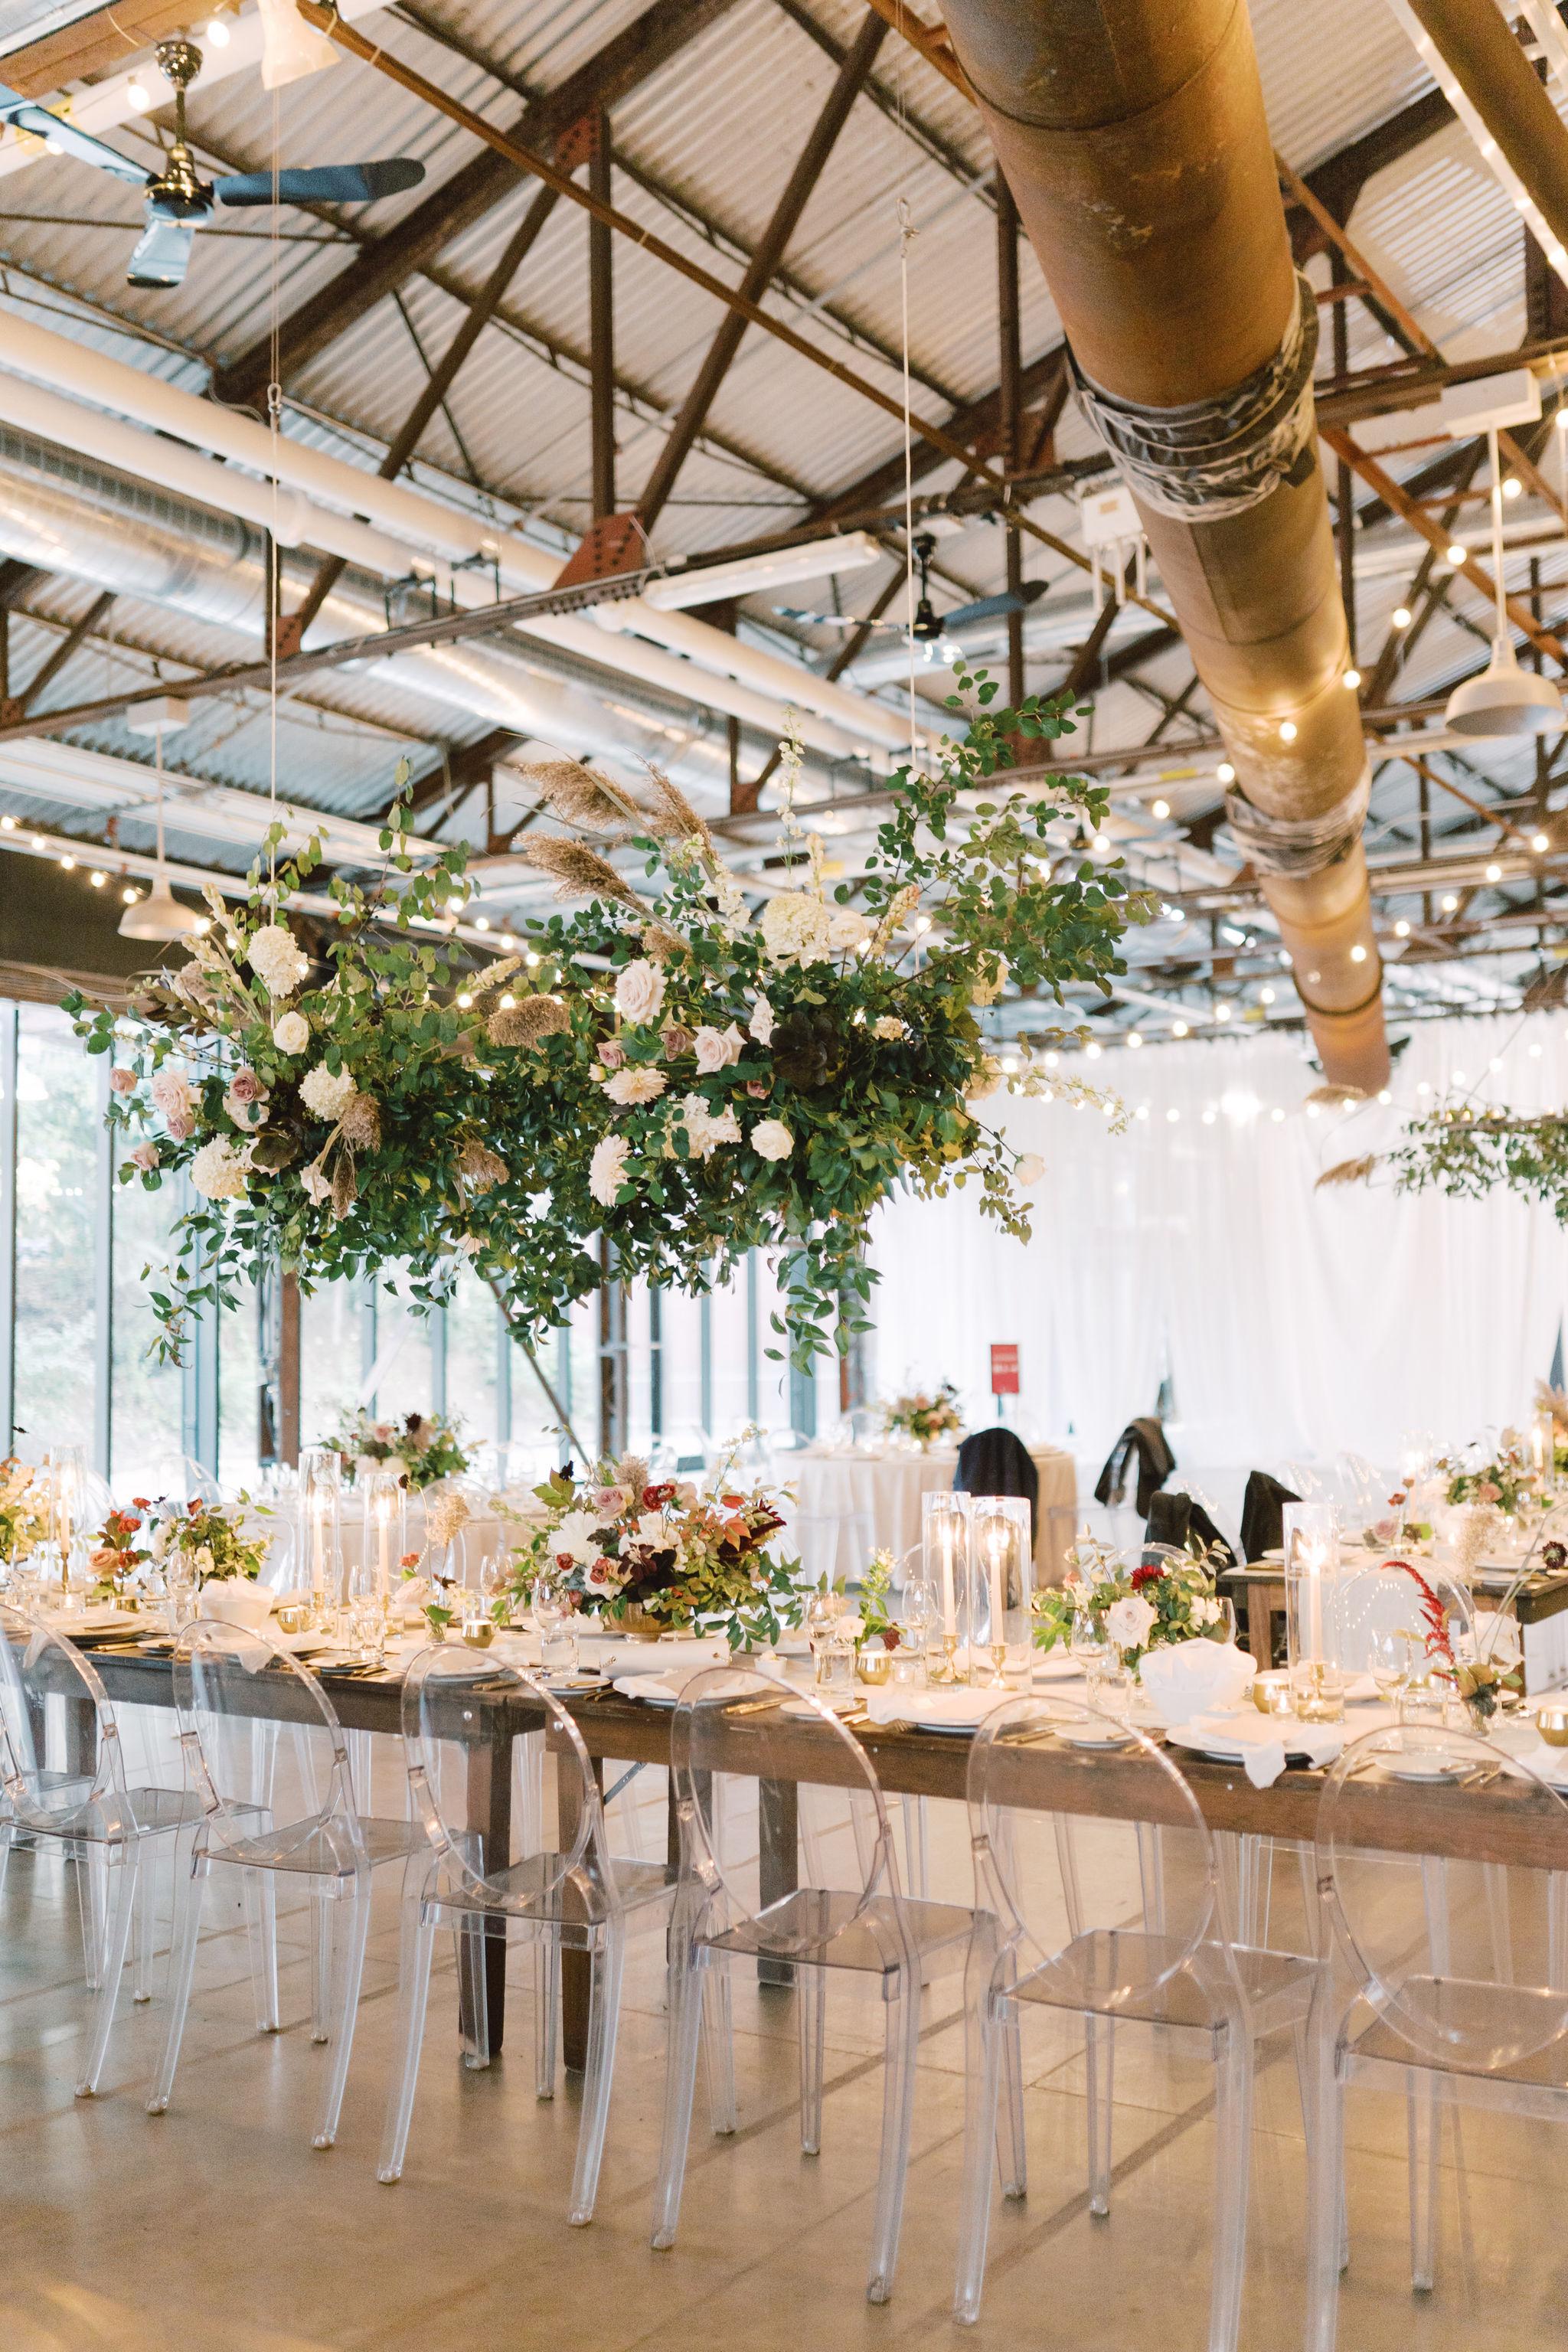 1402-artiese-evergreen-brickworks-wedding-ashleycraig-03958.jpg